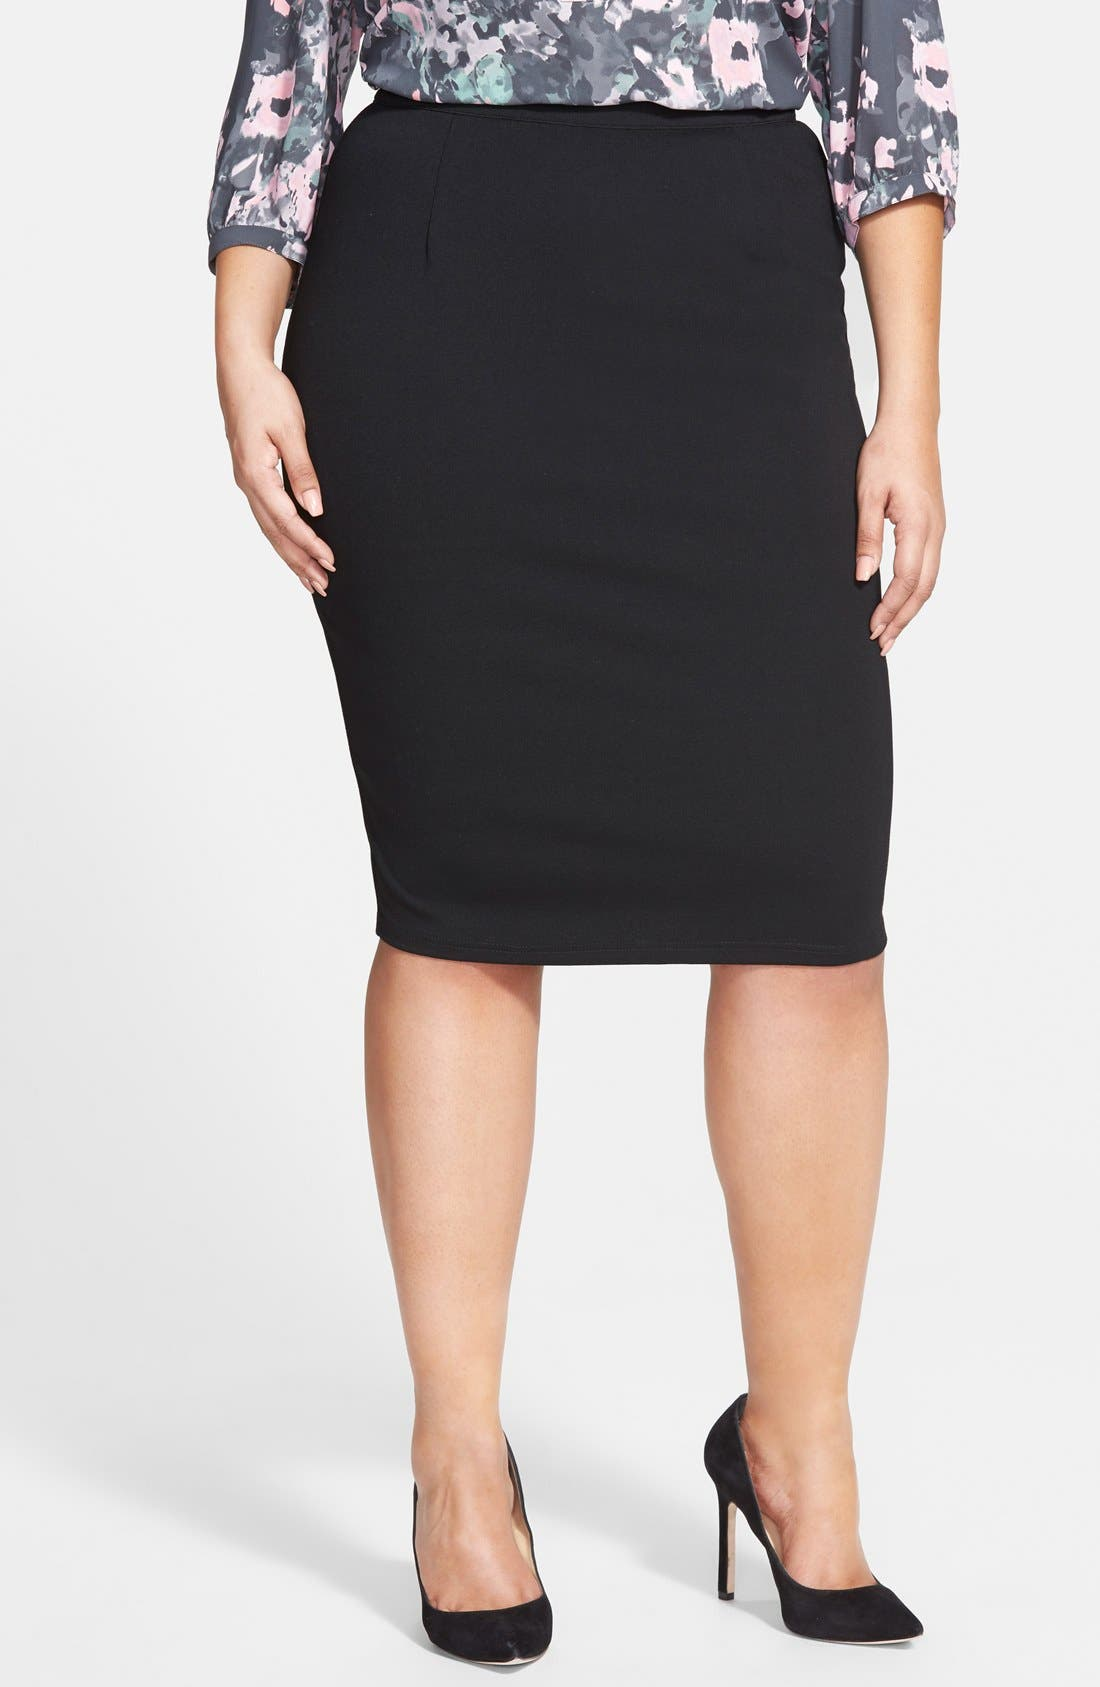 Plus Size City Chic Back Zip Tube Skirt